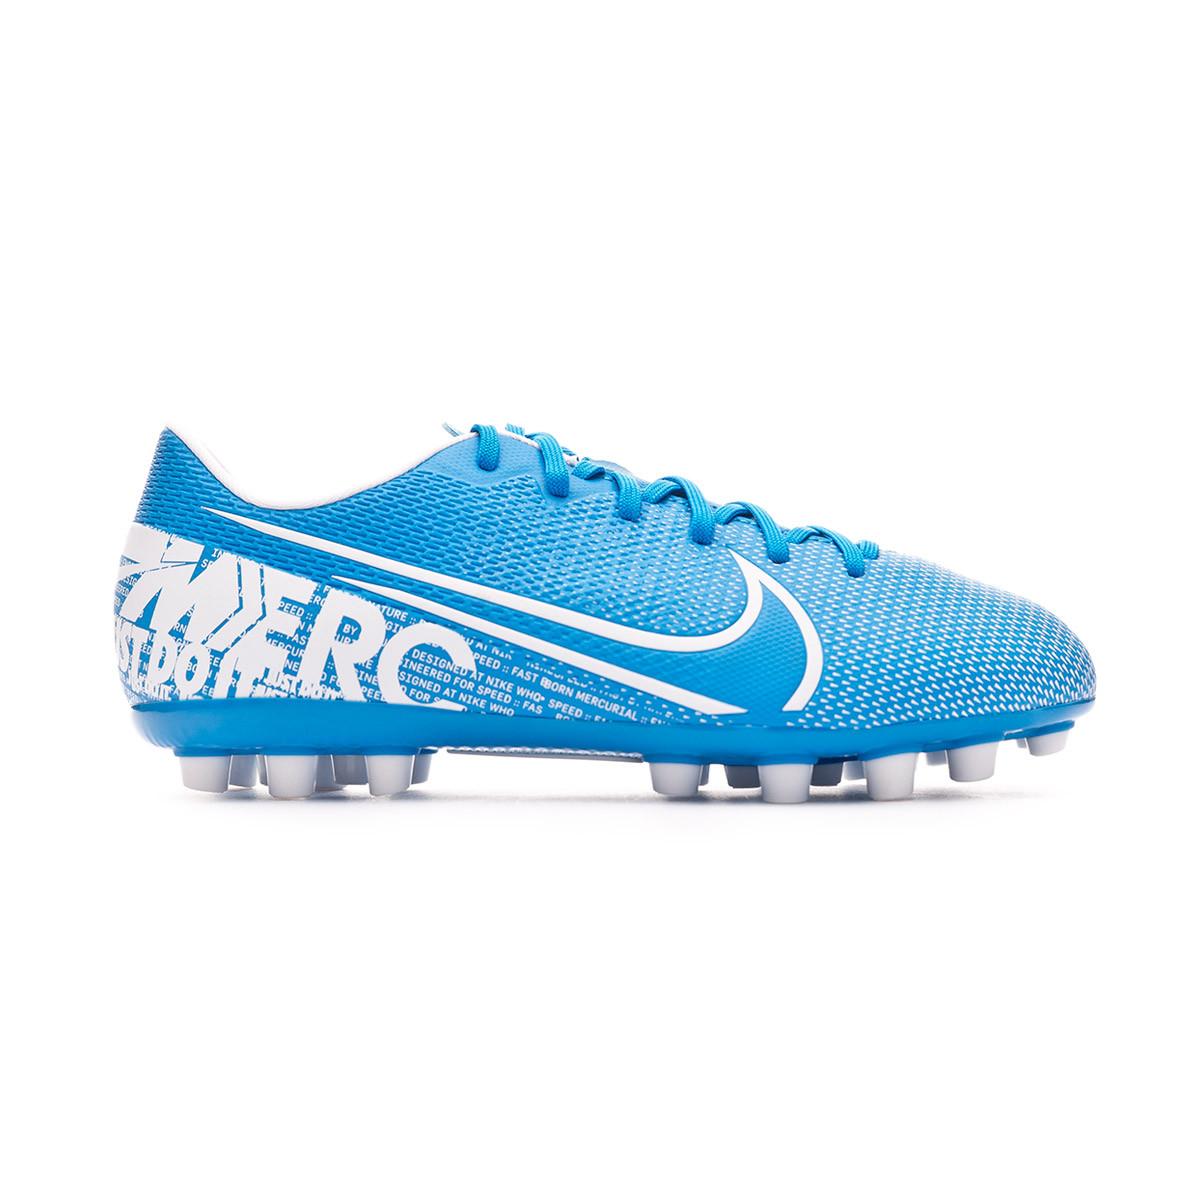 Hablar con favorito Nublado  Bota de fútbol Nike Mercurial Vapor XIII Academy AG-Pro Niño Blue  hero-White-Obsidian - Tienda de fútbol Fútbol Emotion